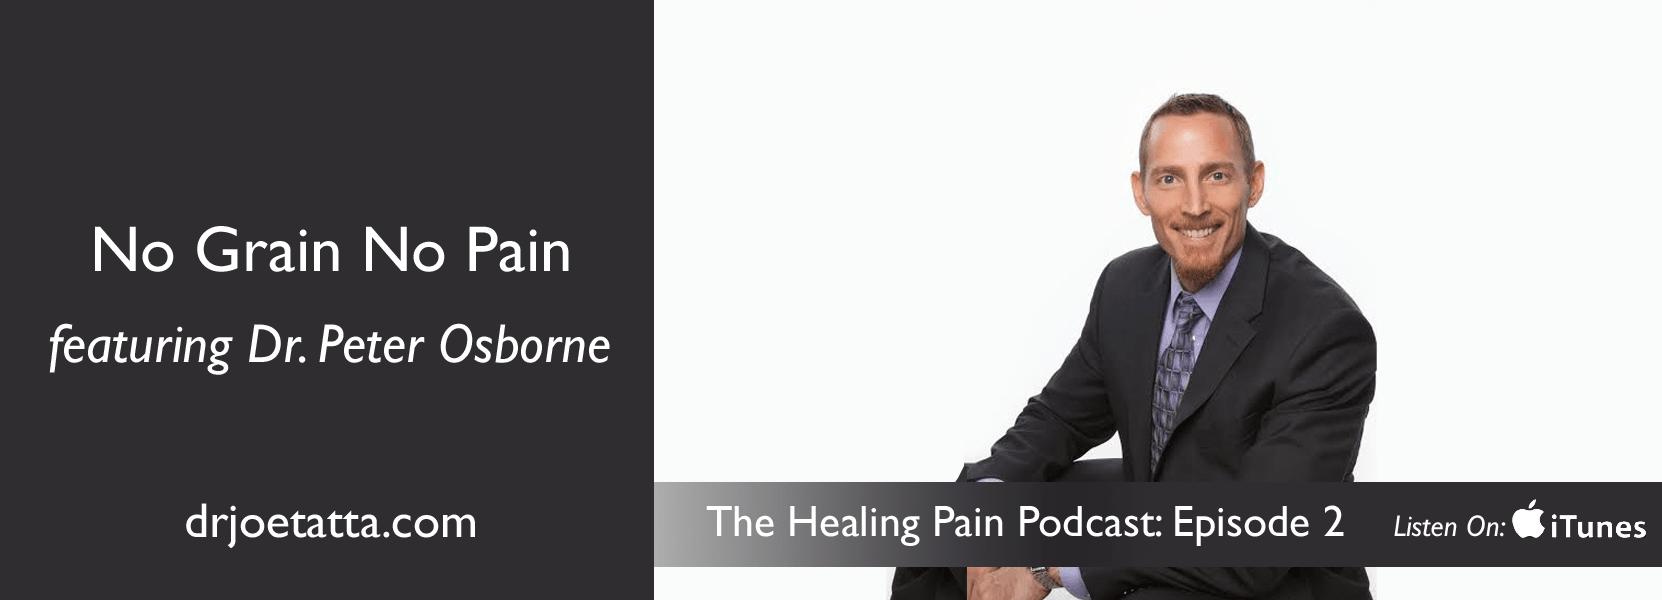 No-Grain-No-Pain-Episode-2